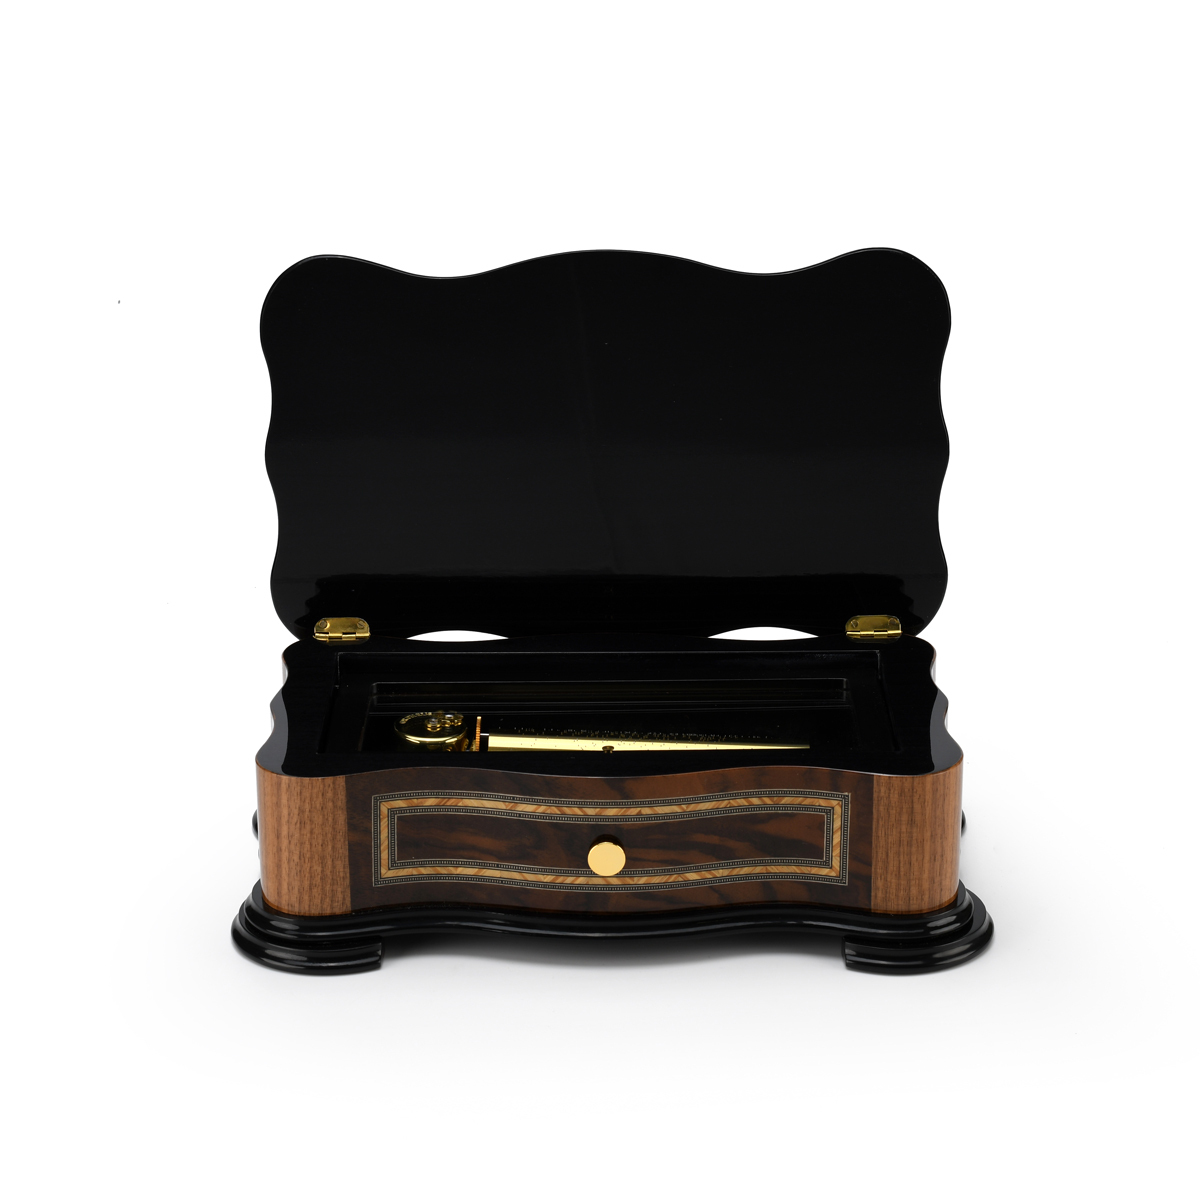 Handcrafted Italian Classic Style 50 Note Sankyo Grand Music Box